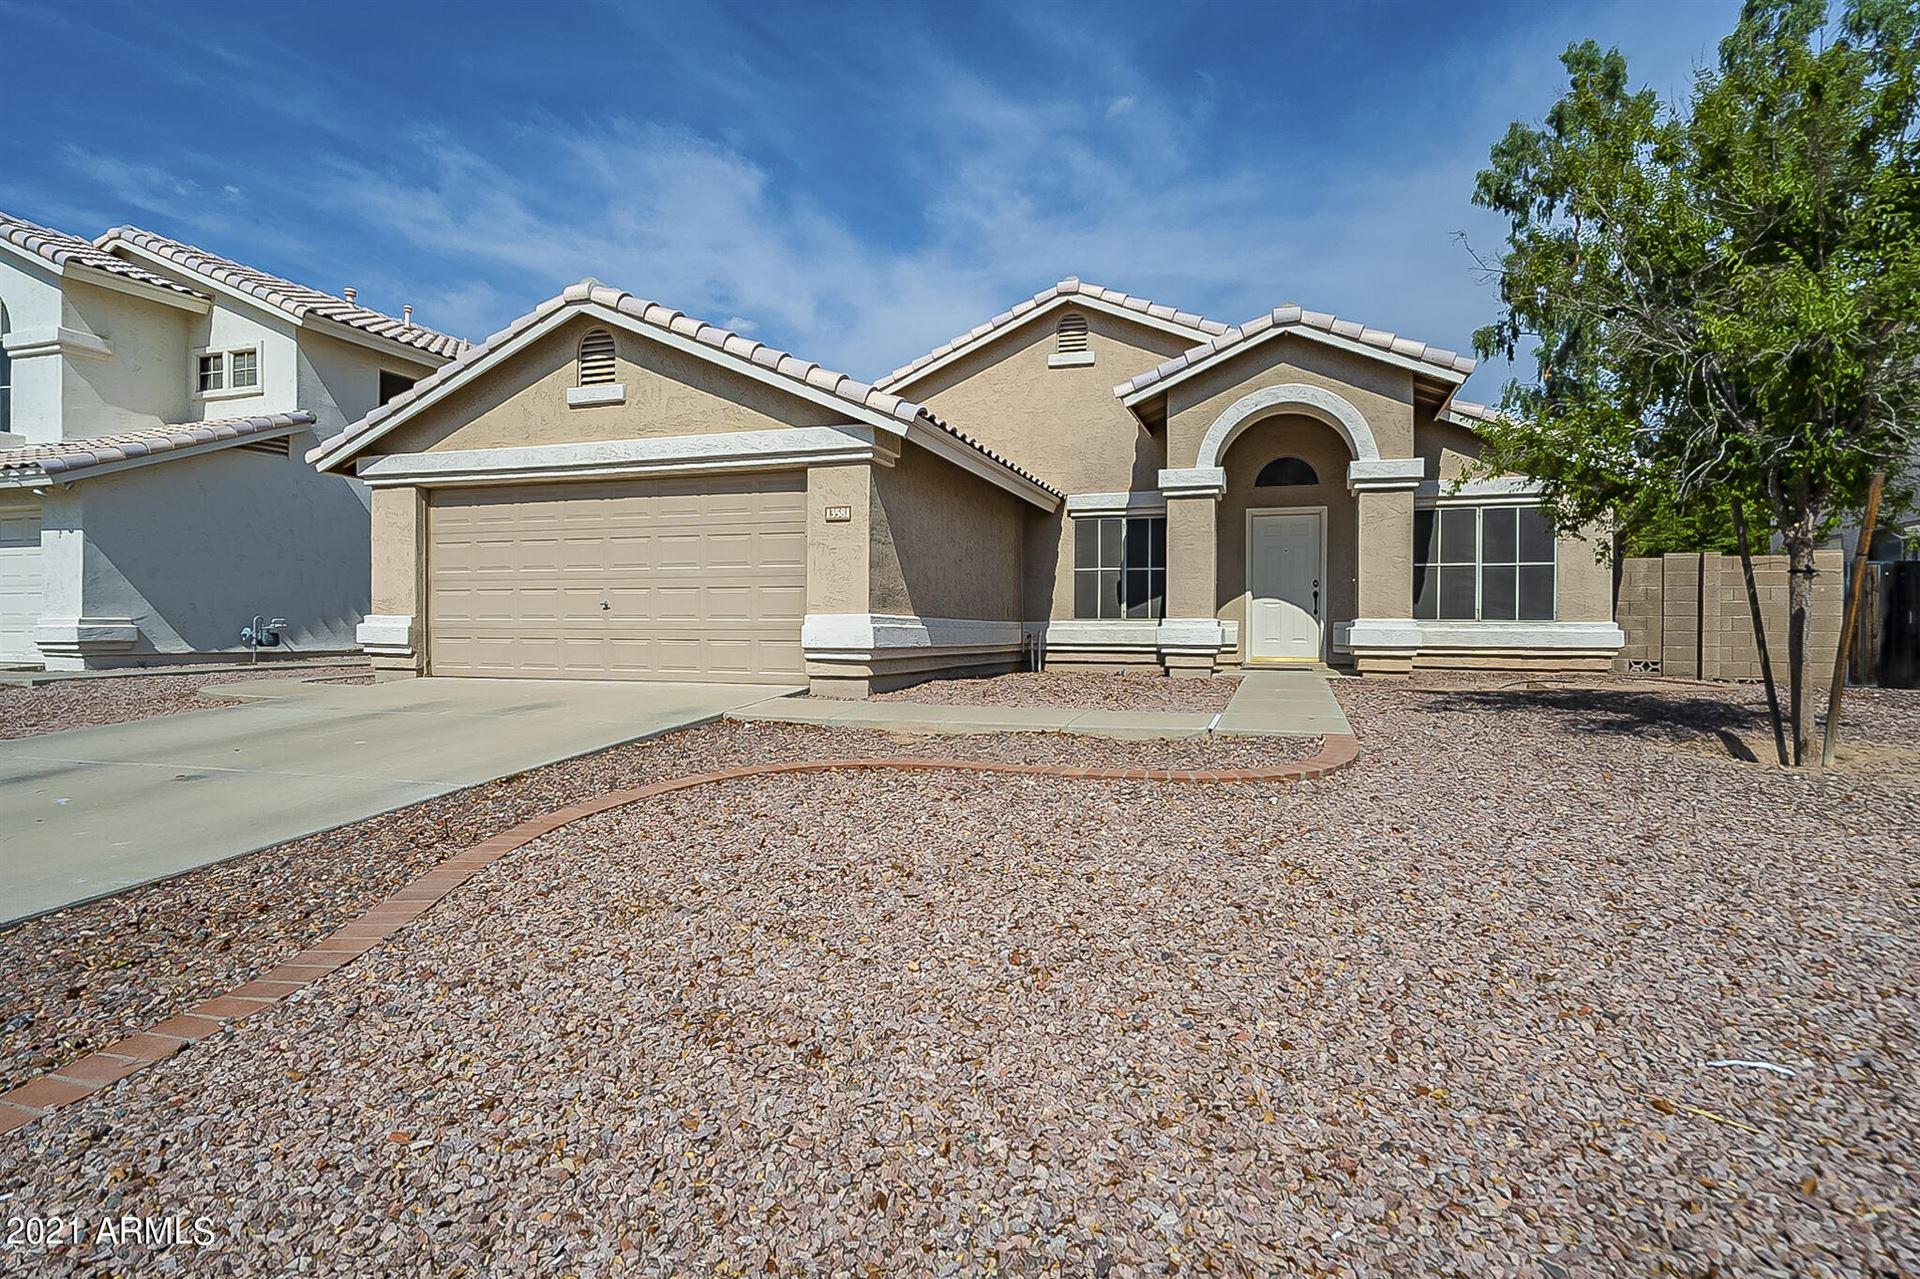 Photo of 13581 N 79th Lane, Peoria, AZ 85381 (MLS # 6268022)